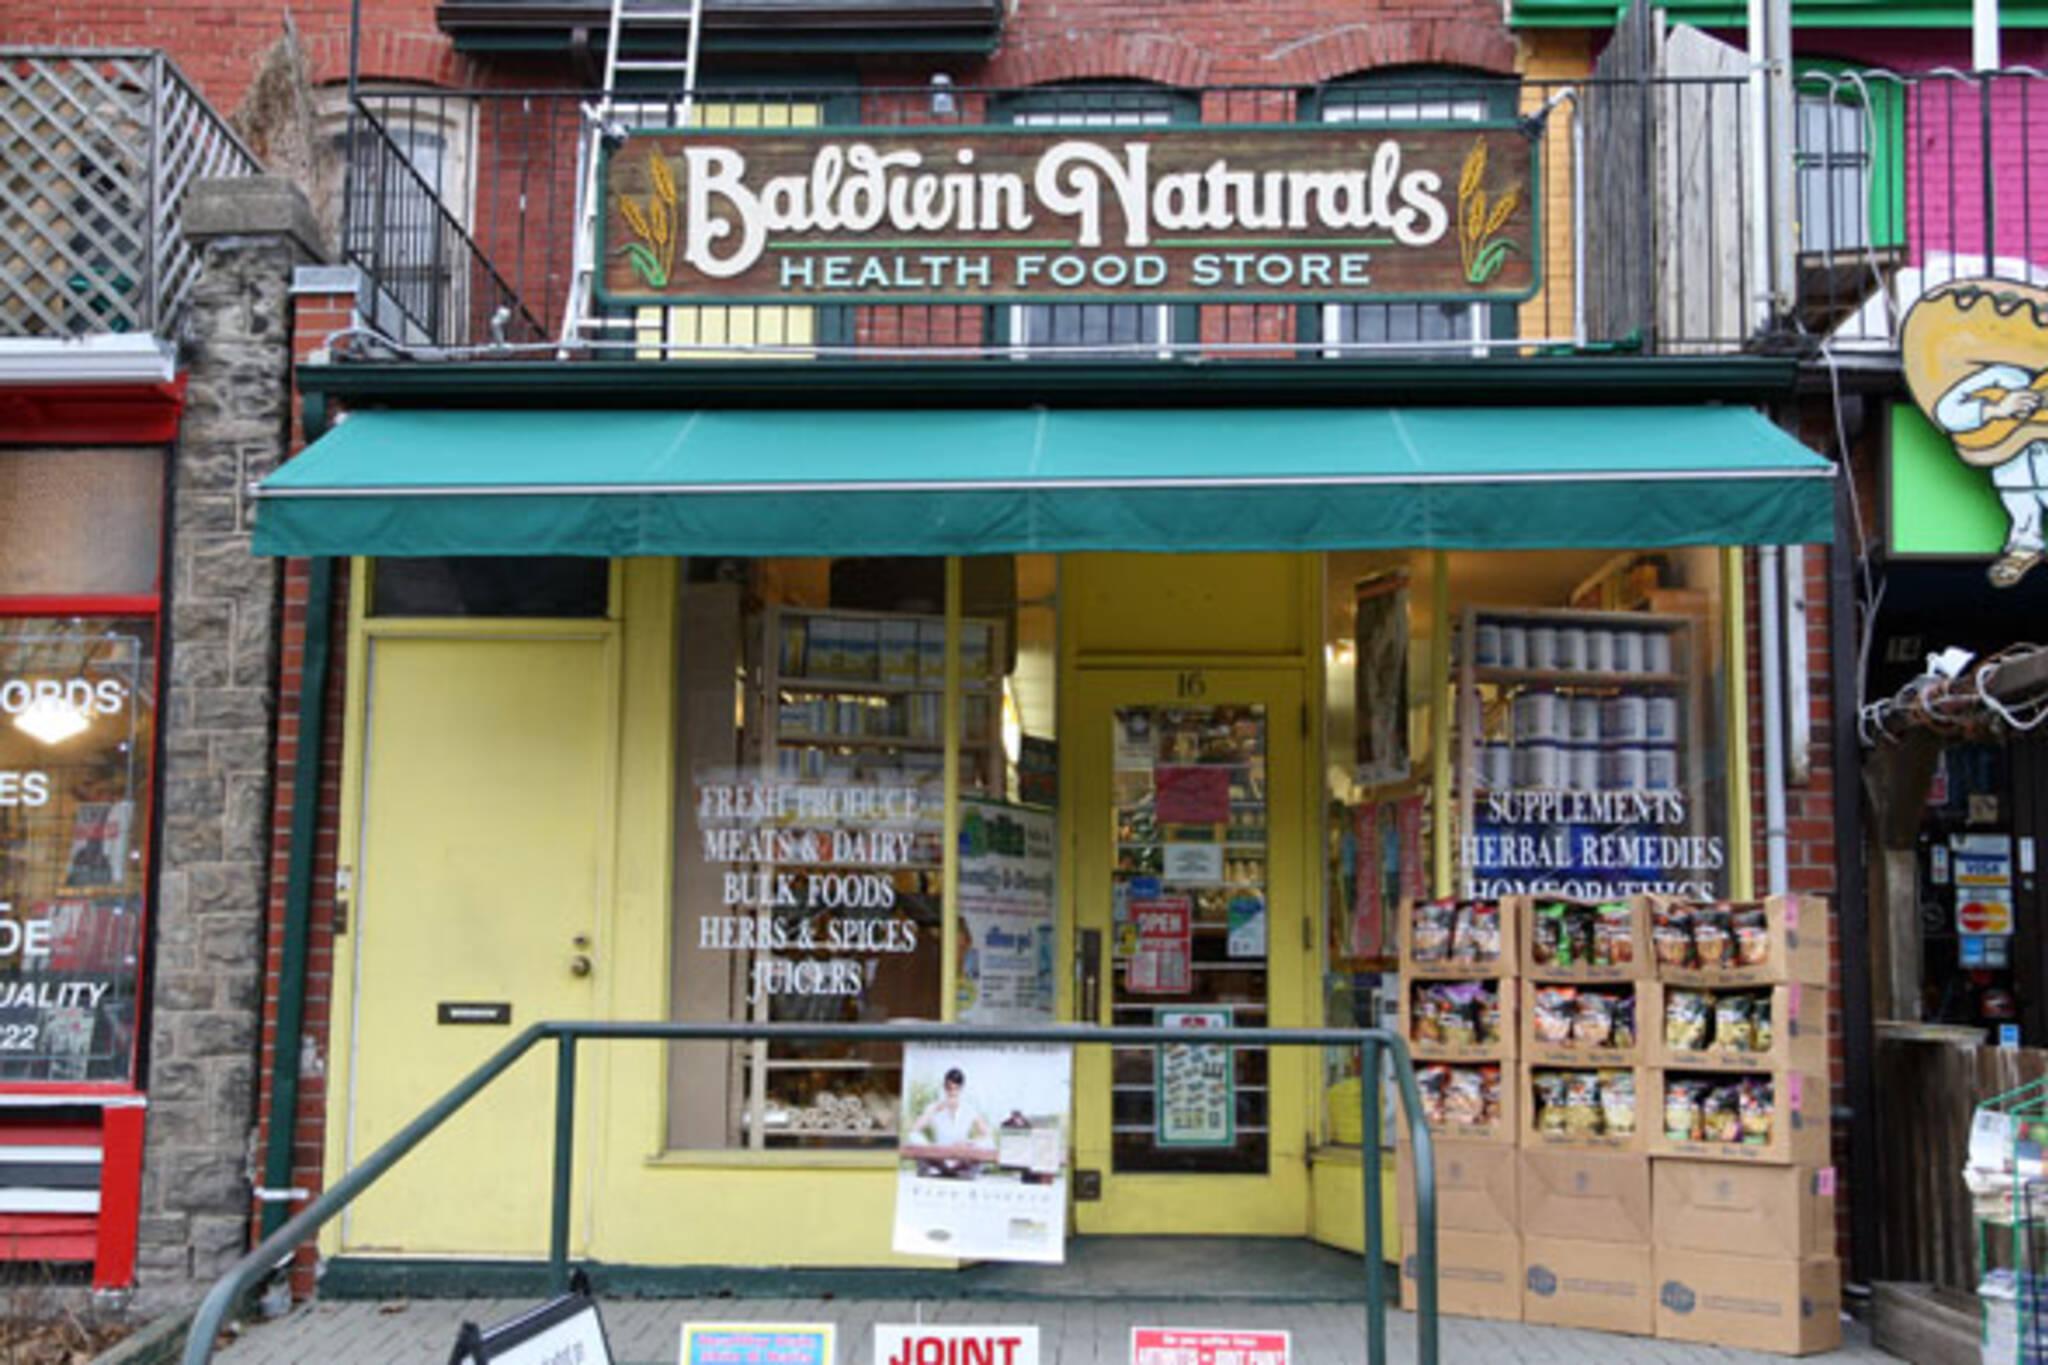 Baldwin Naturals